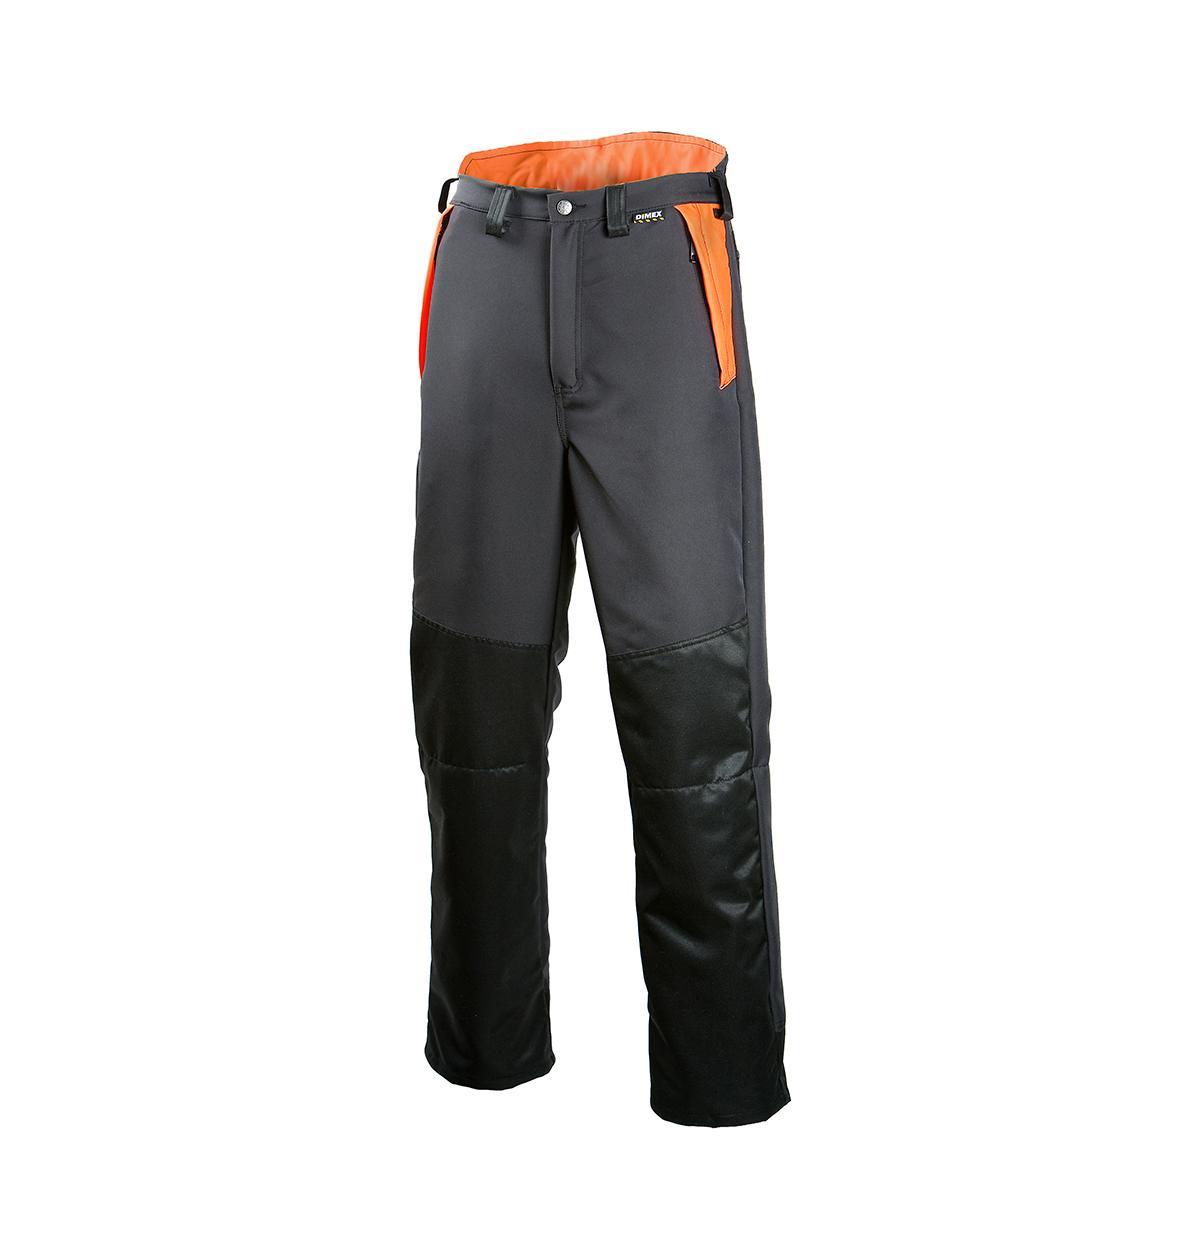 Logger Brushcutter Pants 833 Dimex